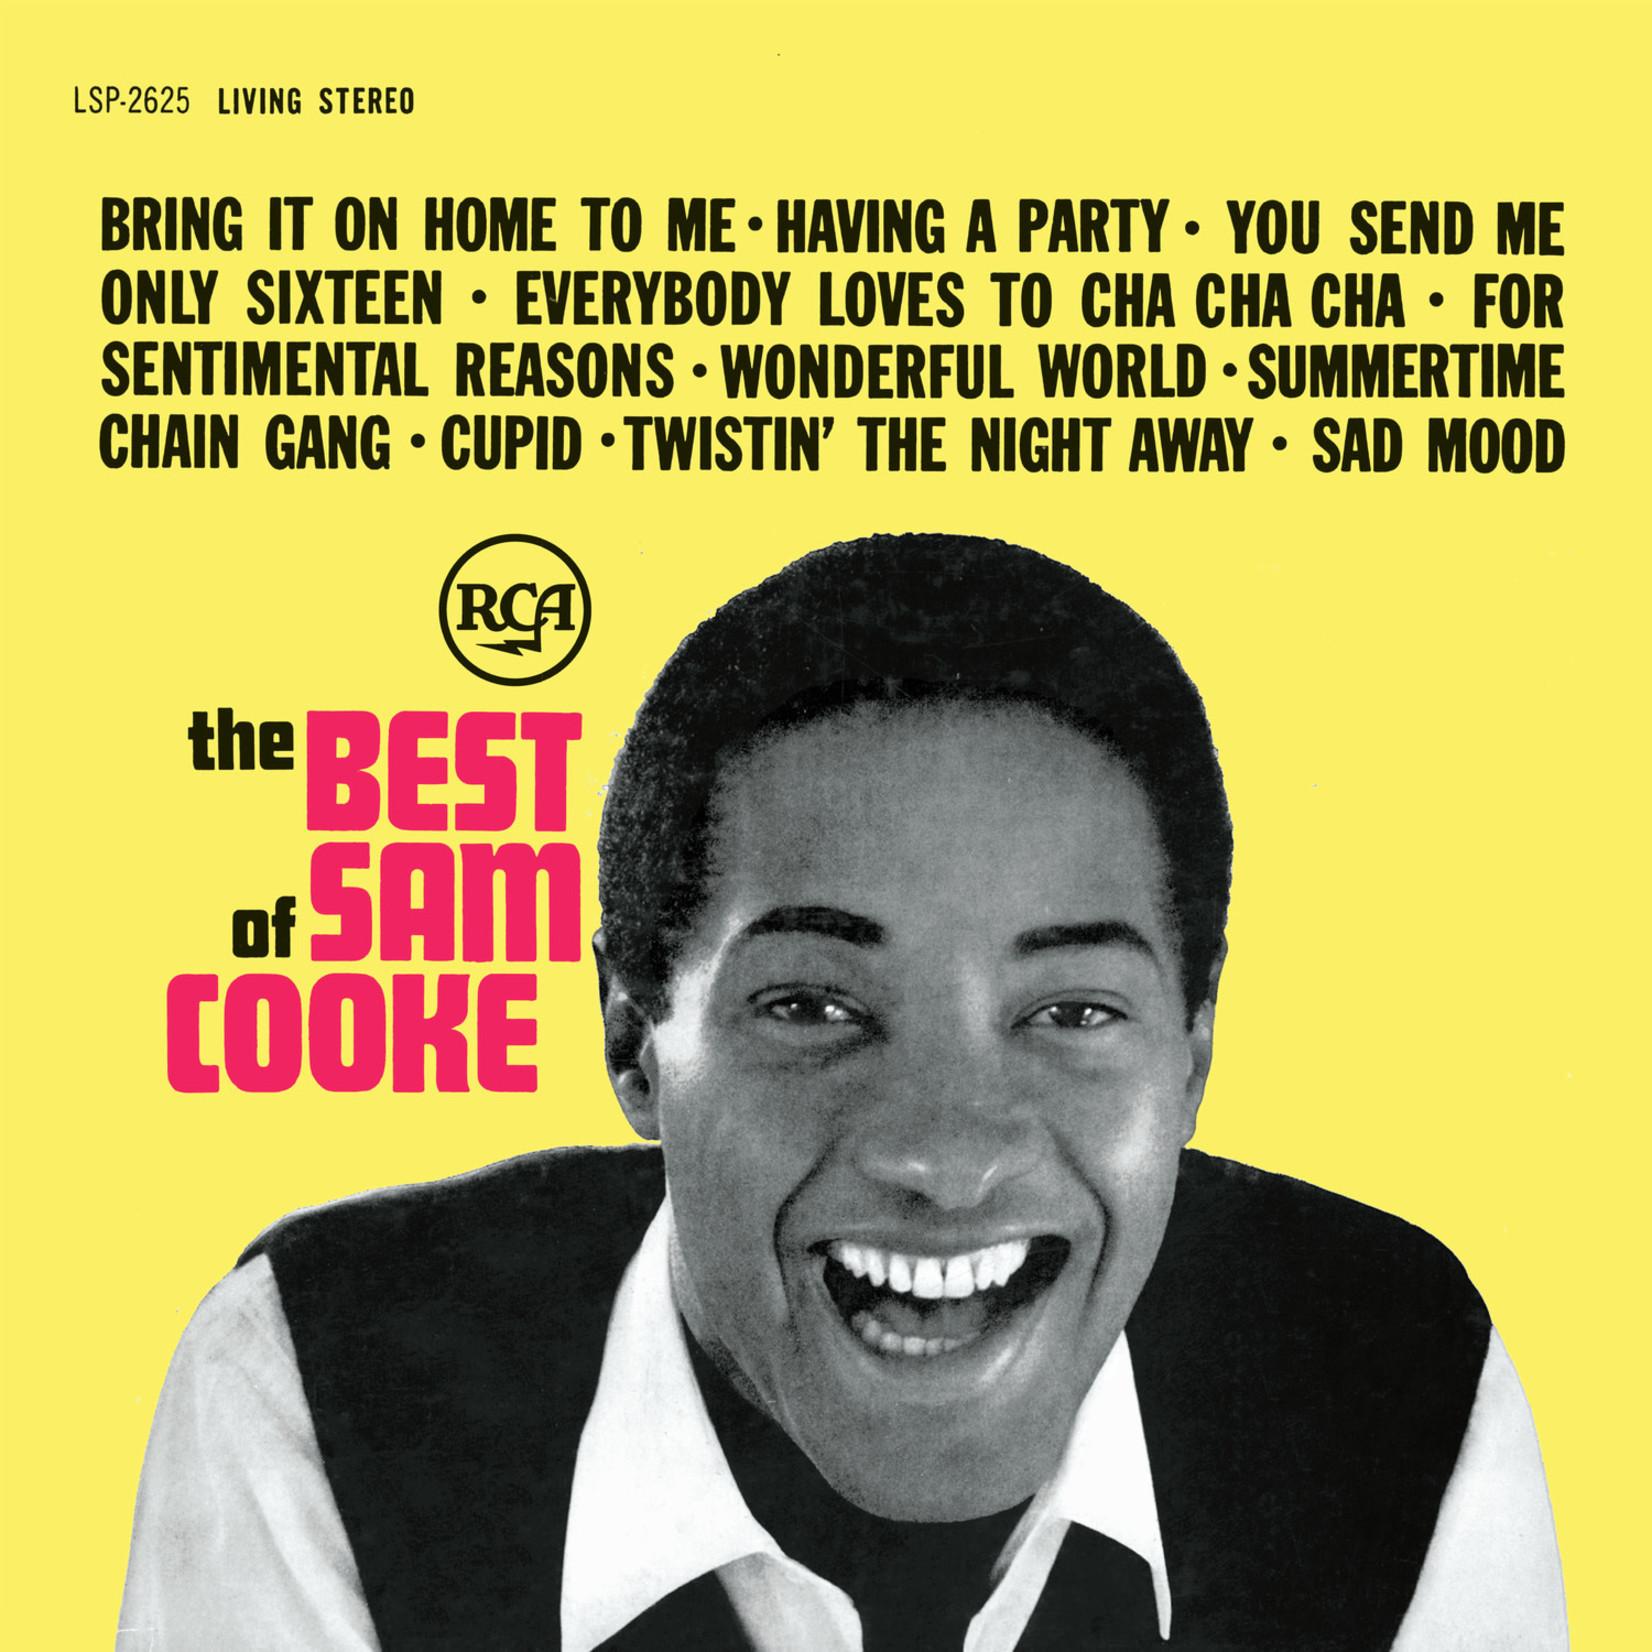 Vinyl Sam Cooke - The Best Of Sam Cooke